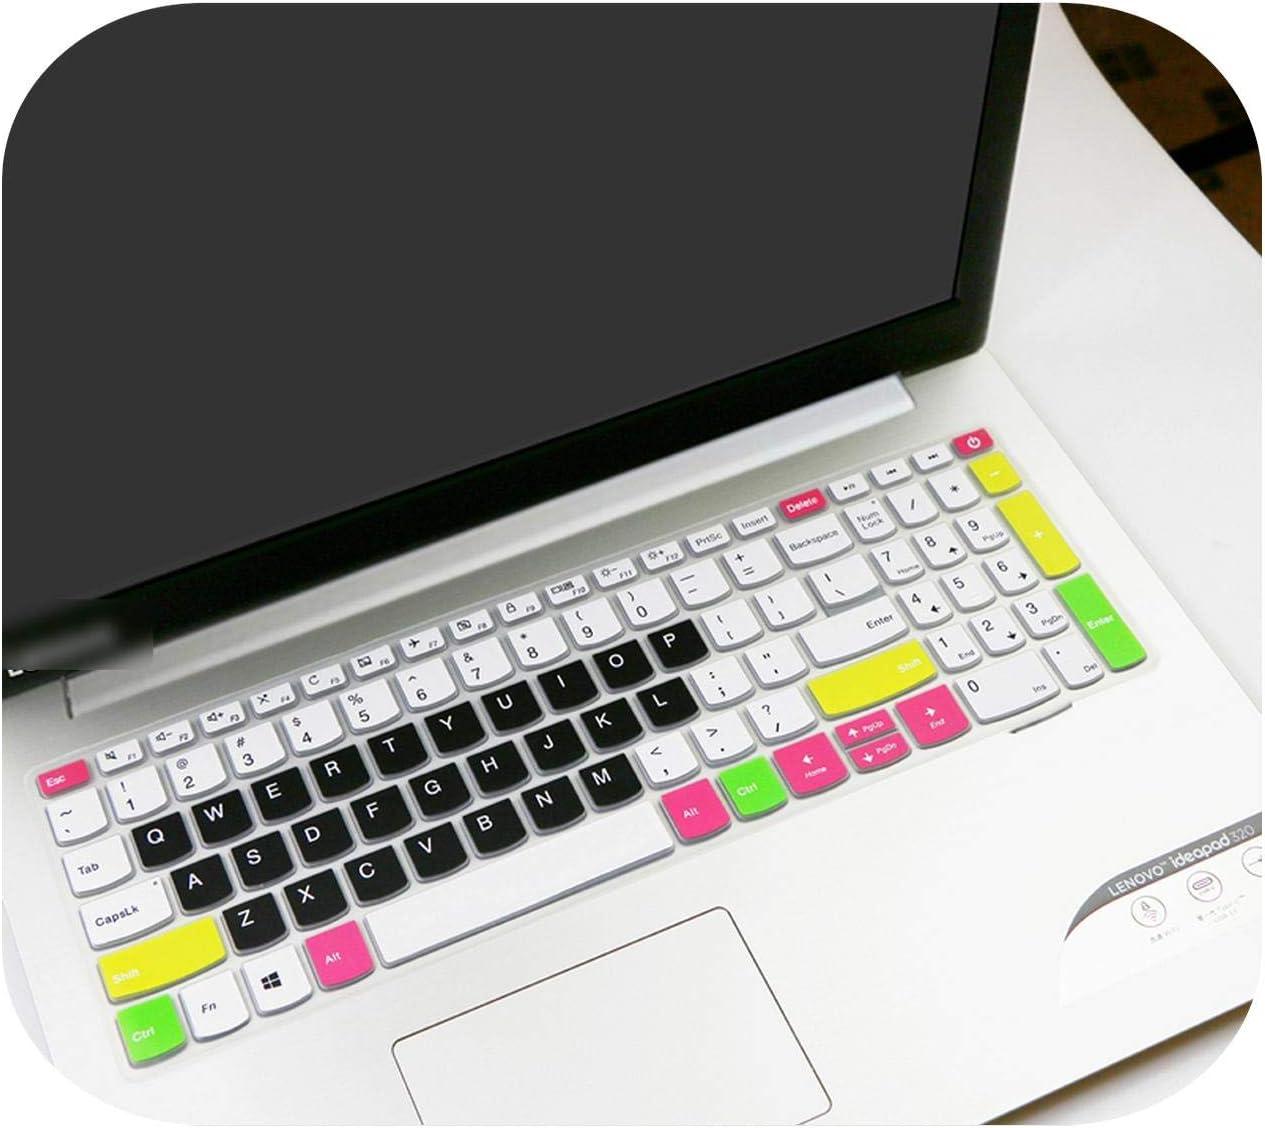 for Lenovo Ideapad 520 520 15 520 15Ikb 520 15Ikbr 720 720 15Ikba 720 15Ikbr 15.6 Inch 15 Laptop Notebook Keyboard Cover Skin-Rainbow